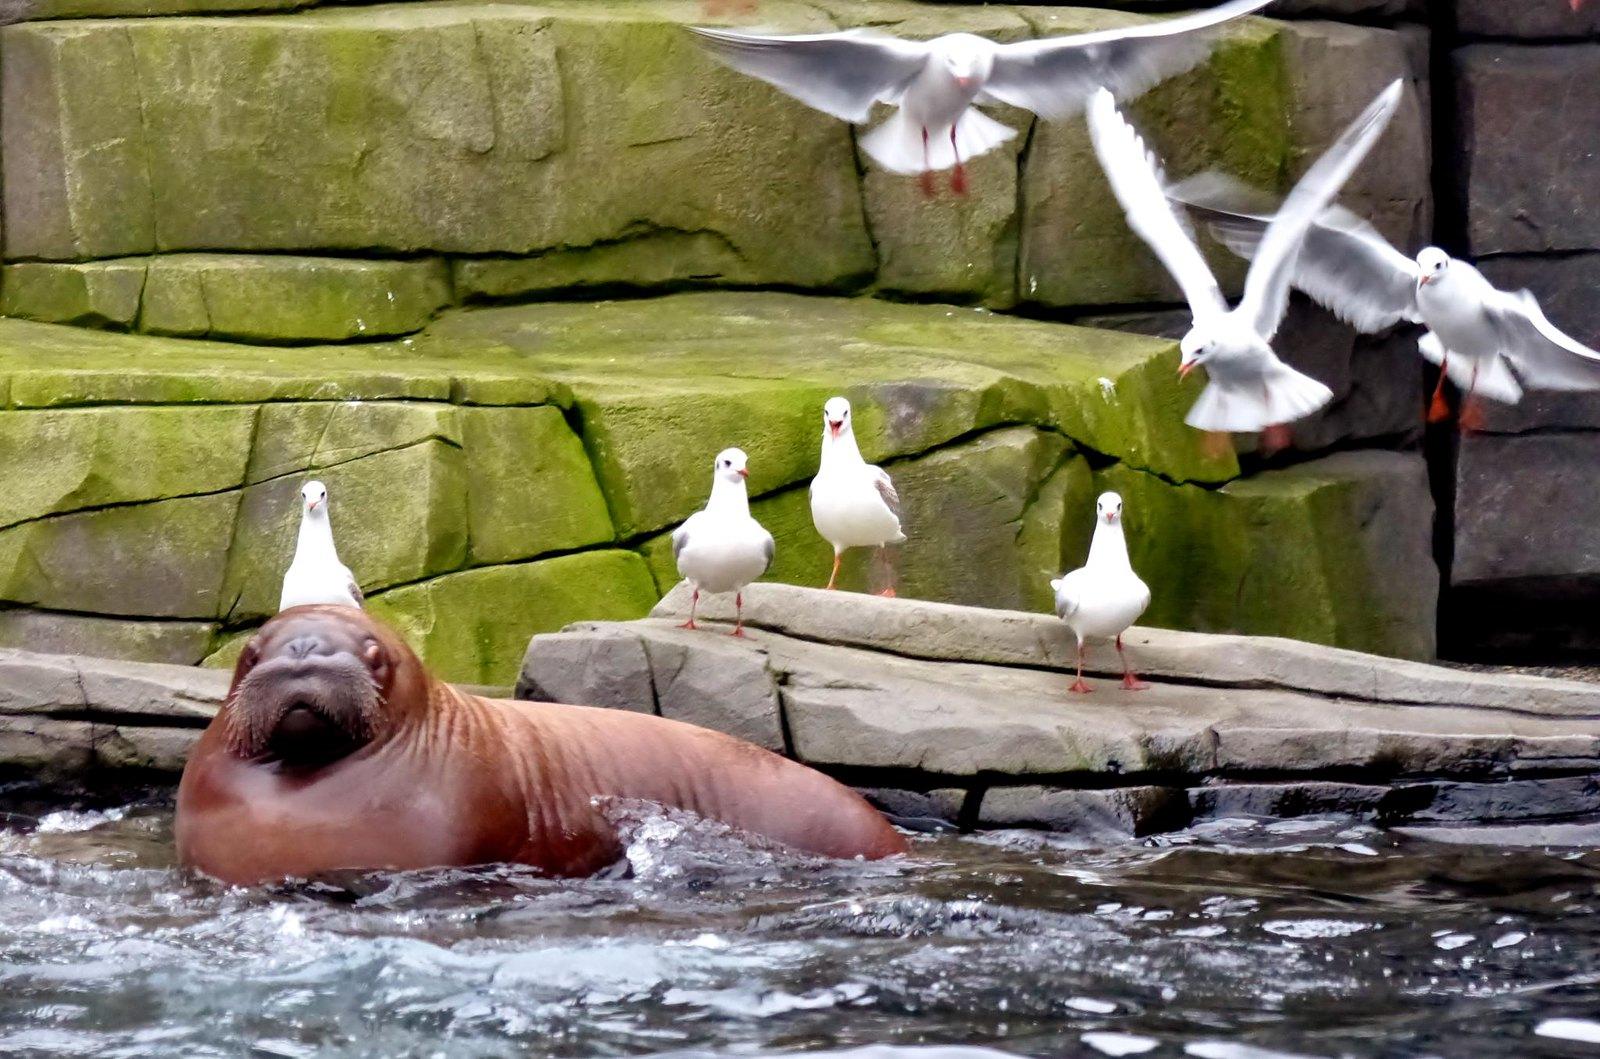 I Am The Walrus... Baby :)